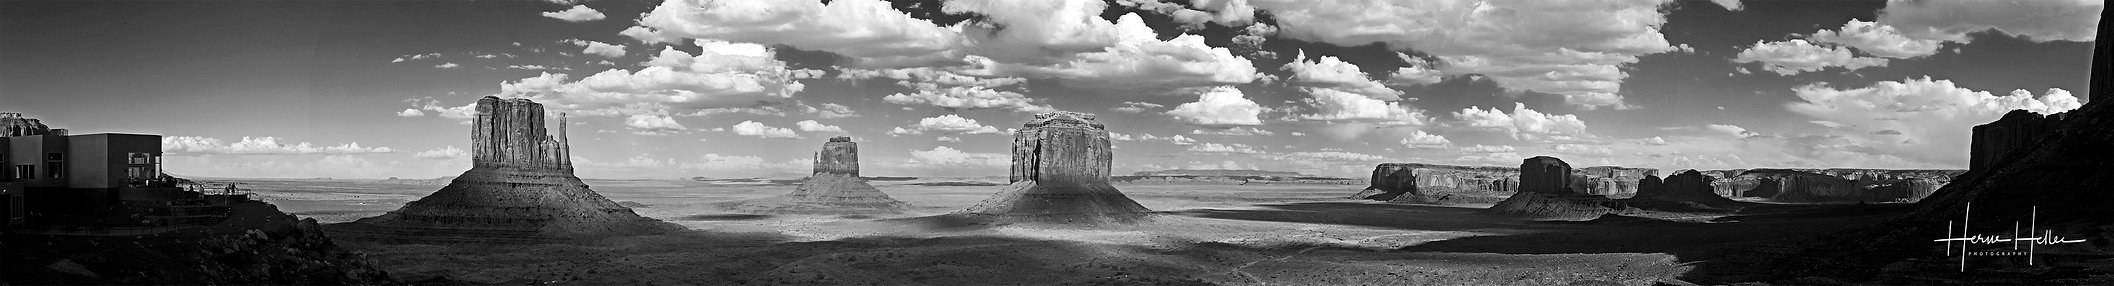 Panorama Monument valley N&B.jpg